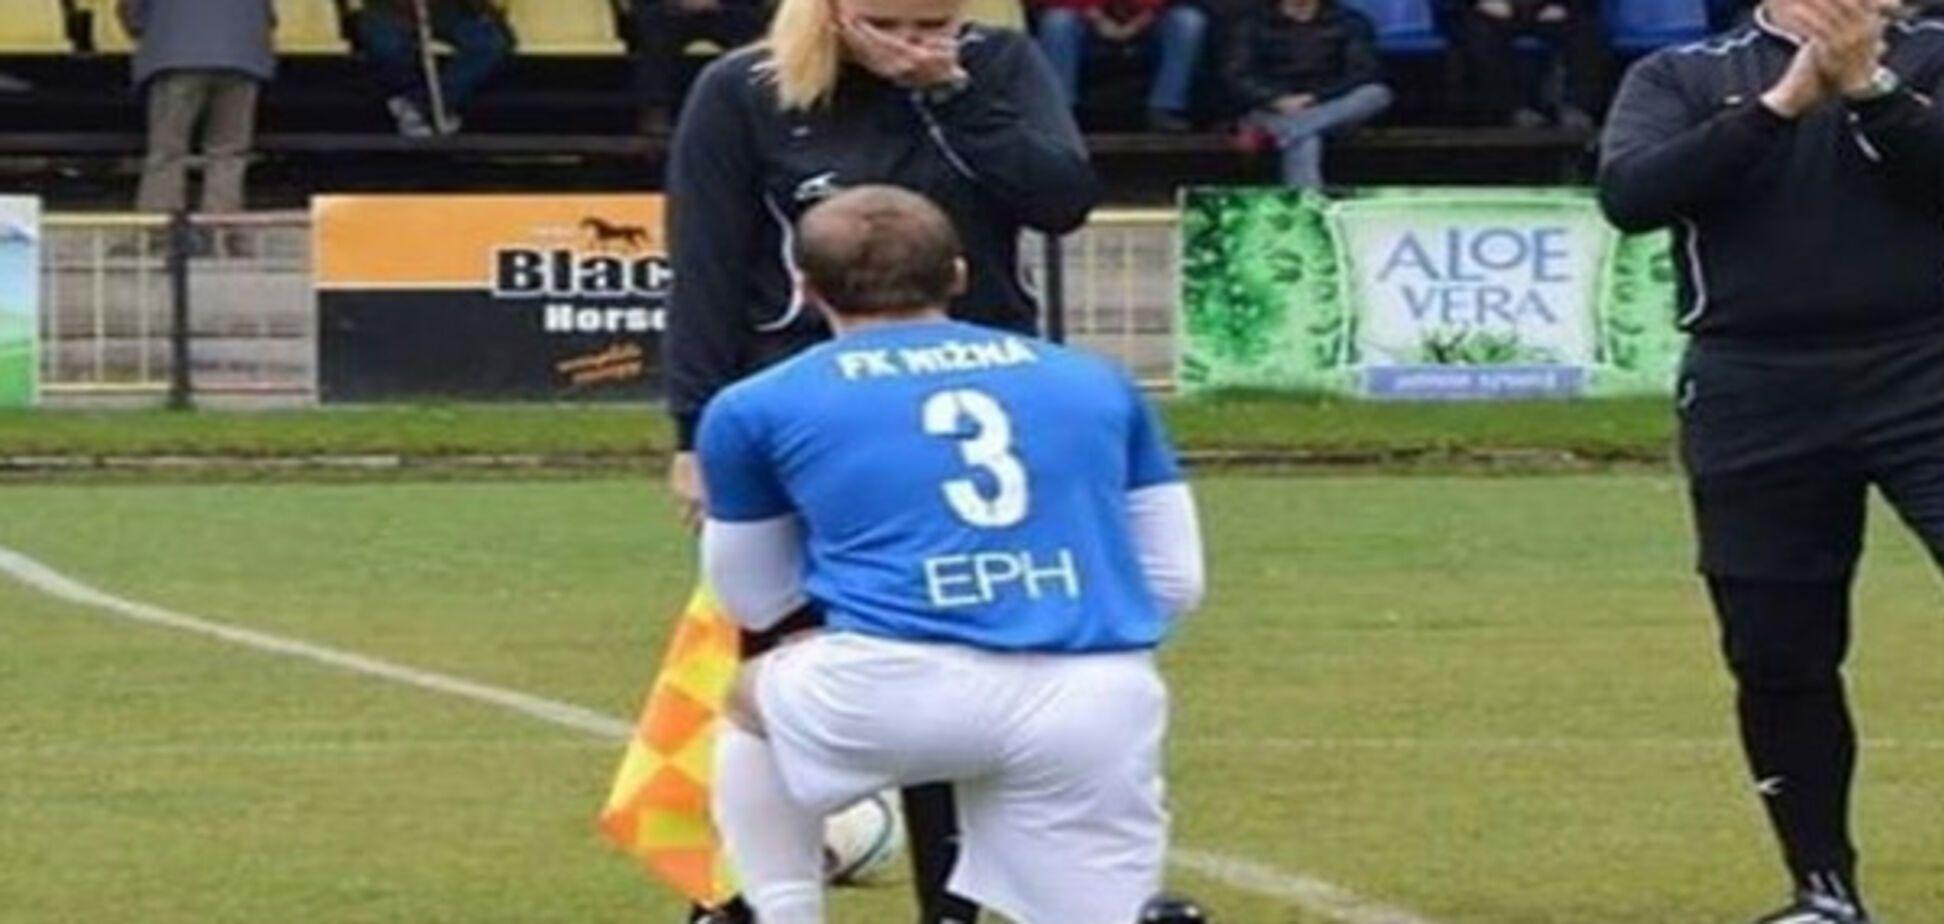 Словацкий футболист сделал арбитру предложение руки и сердца во время матча: фотофакт